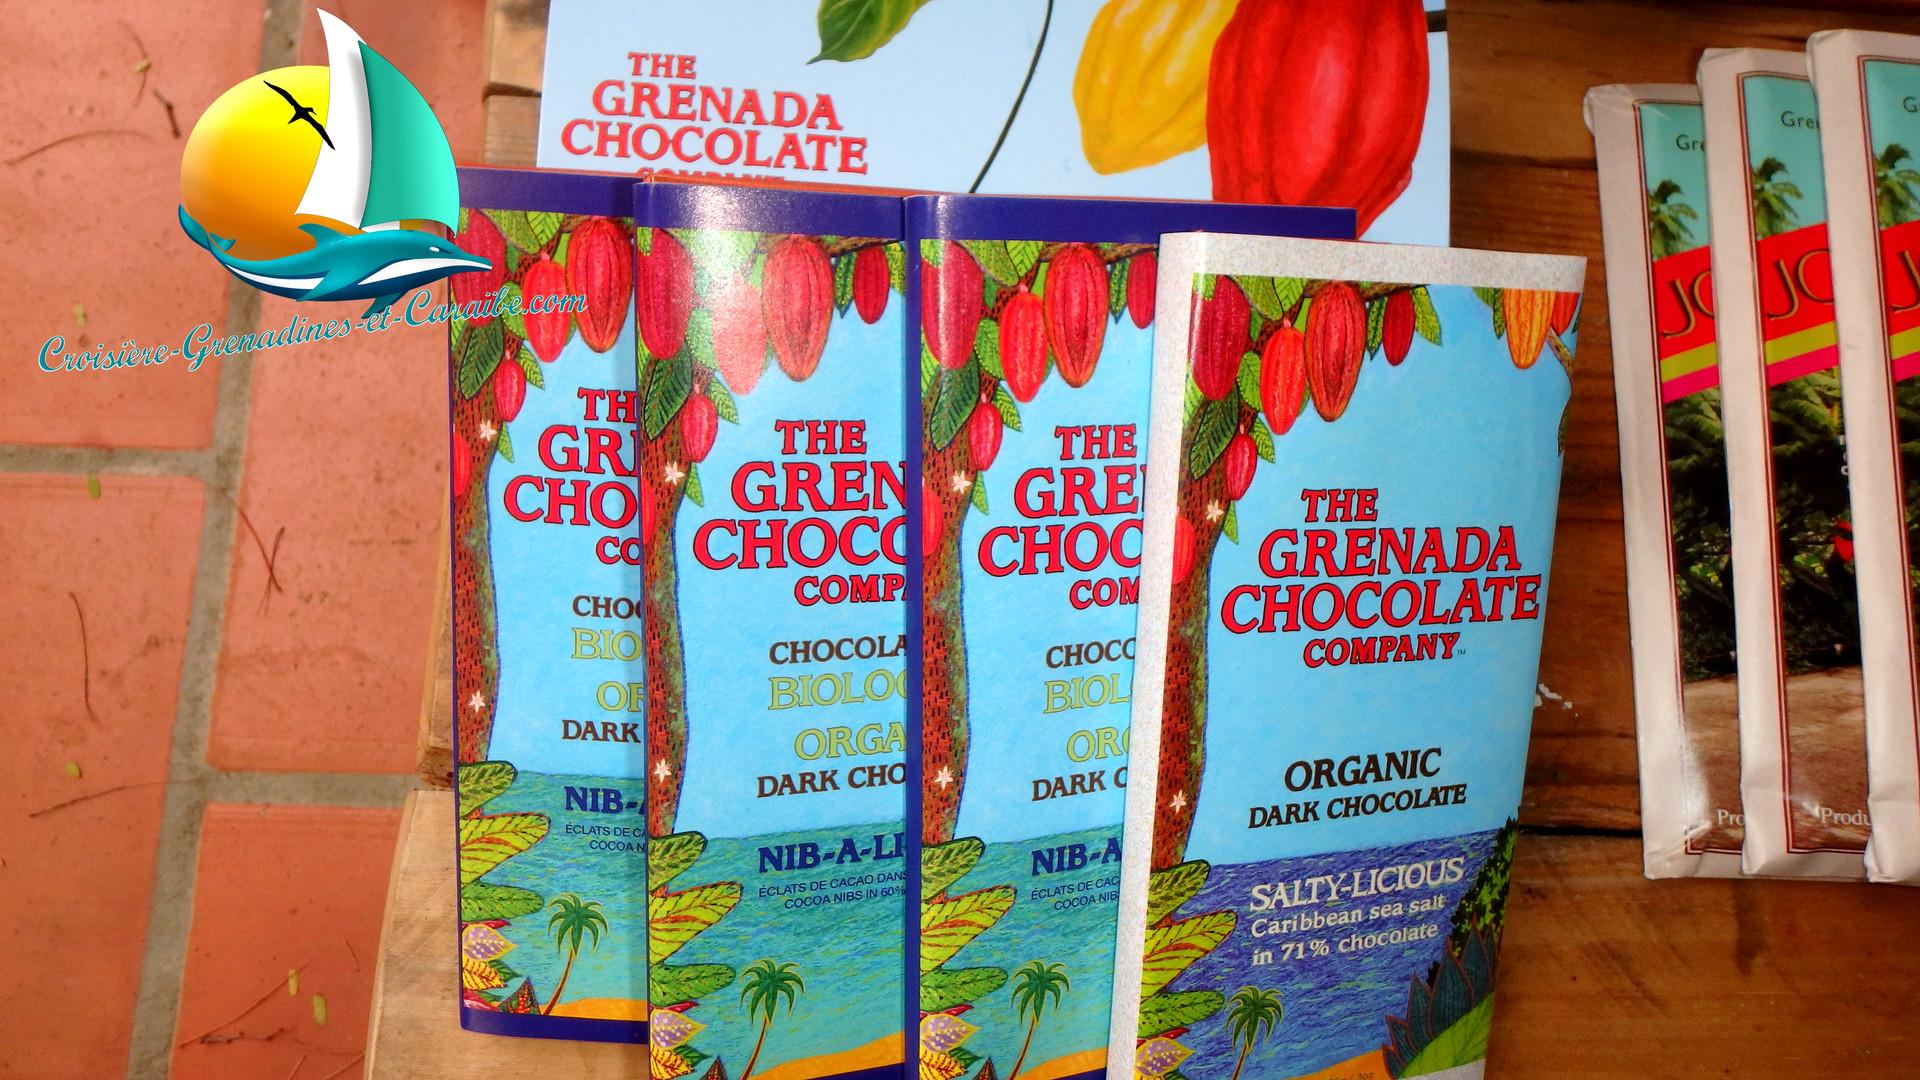 Grenada chocolate company, Grenade, Croisiere Grenadines